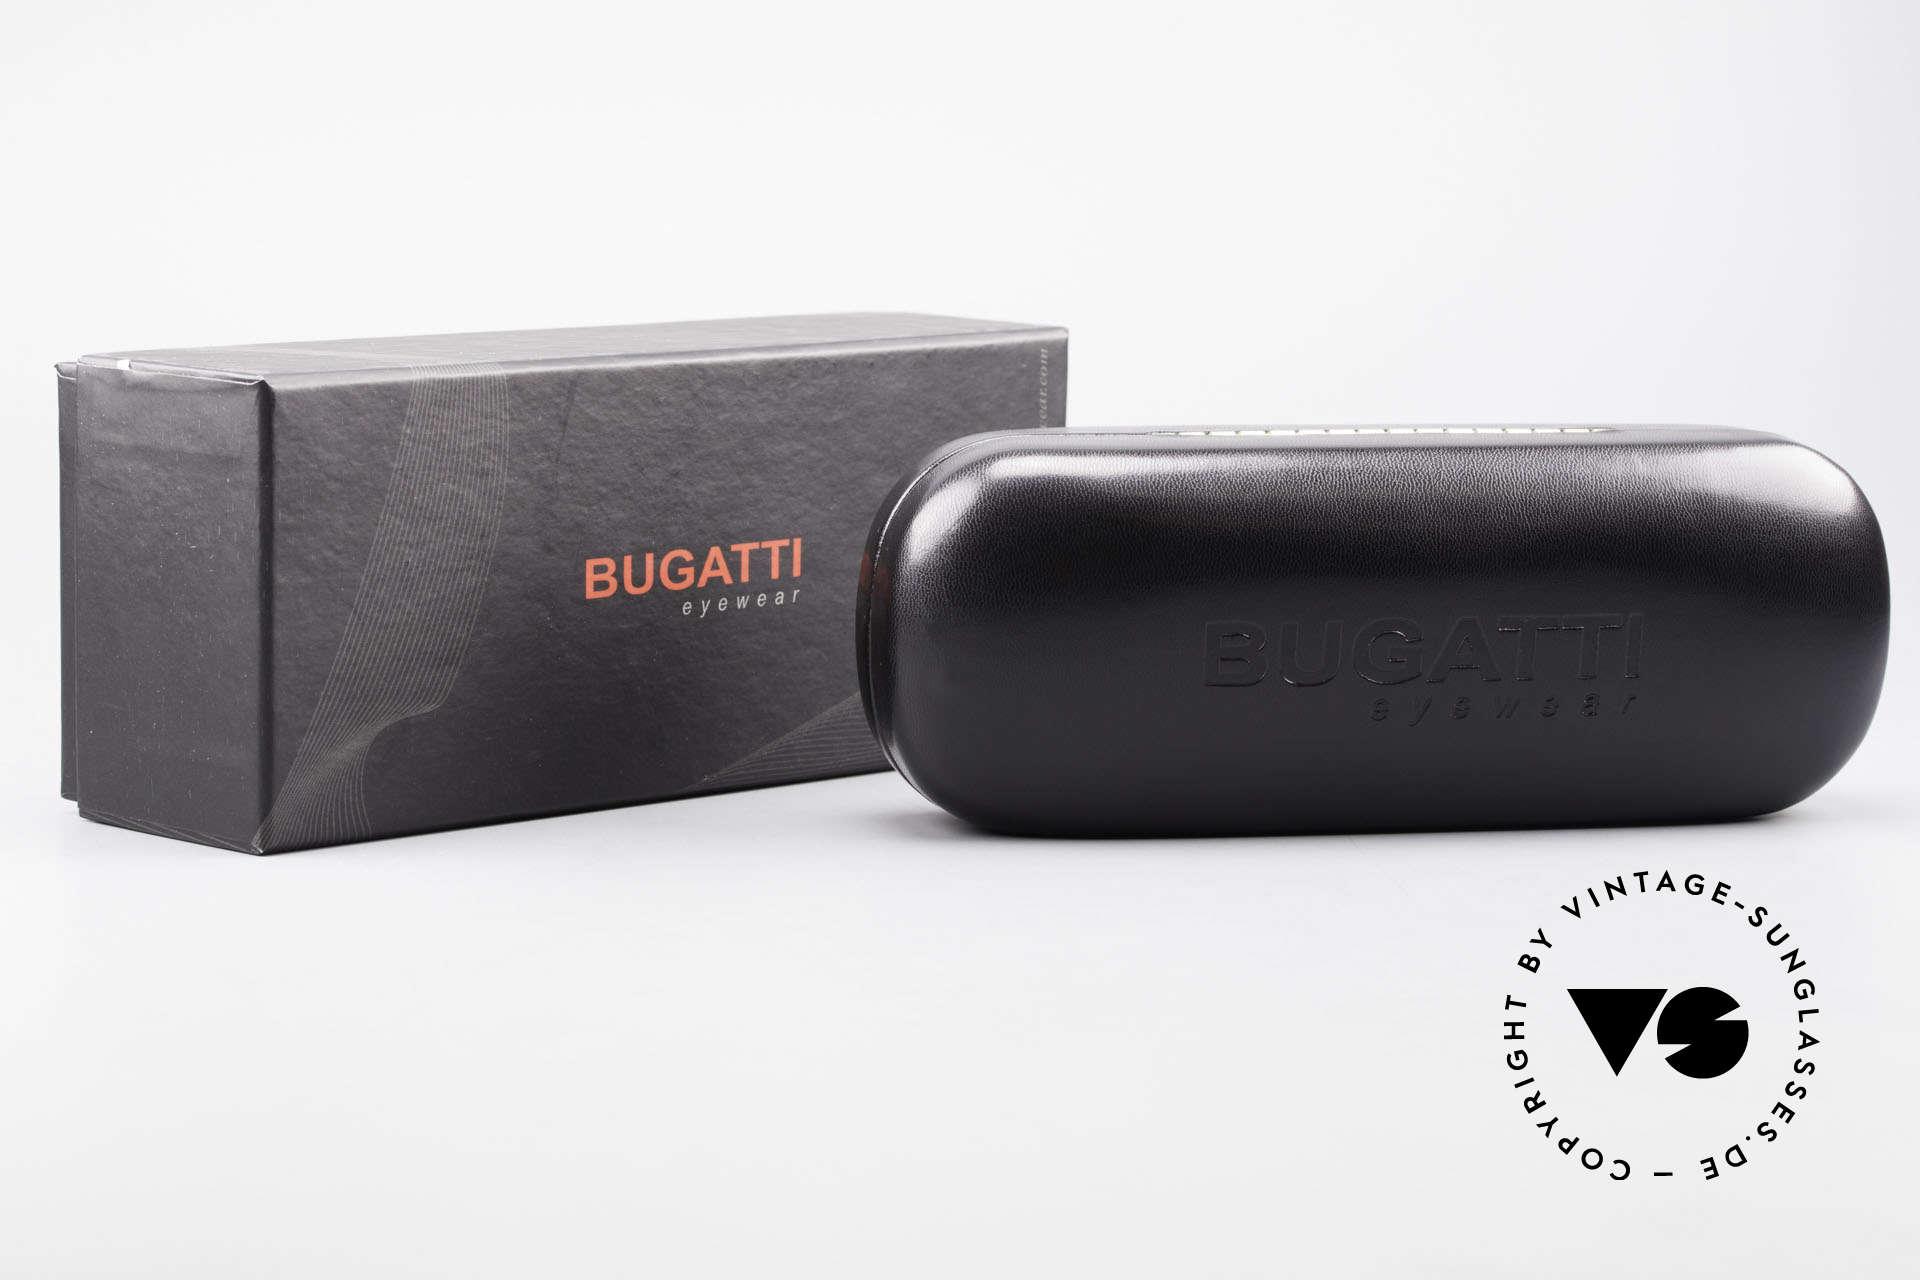 Bugatti 09953 Leaf Spring Temples and Bridge, Size: medium, Made for Men